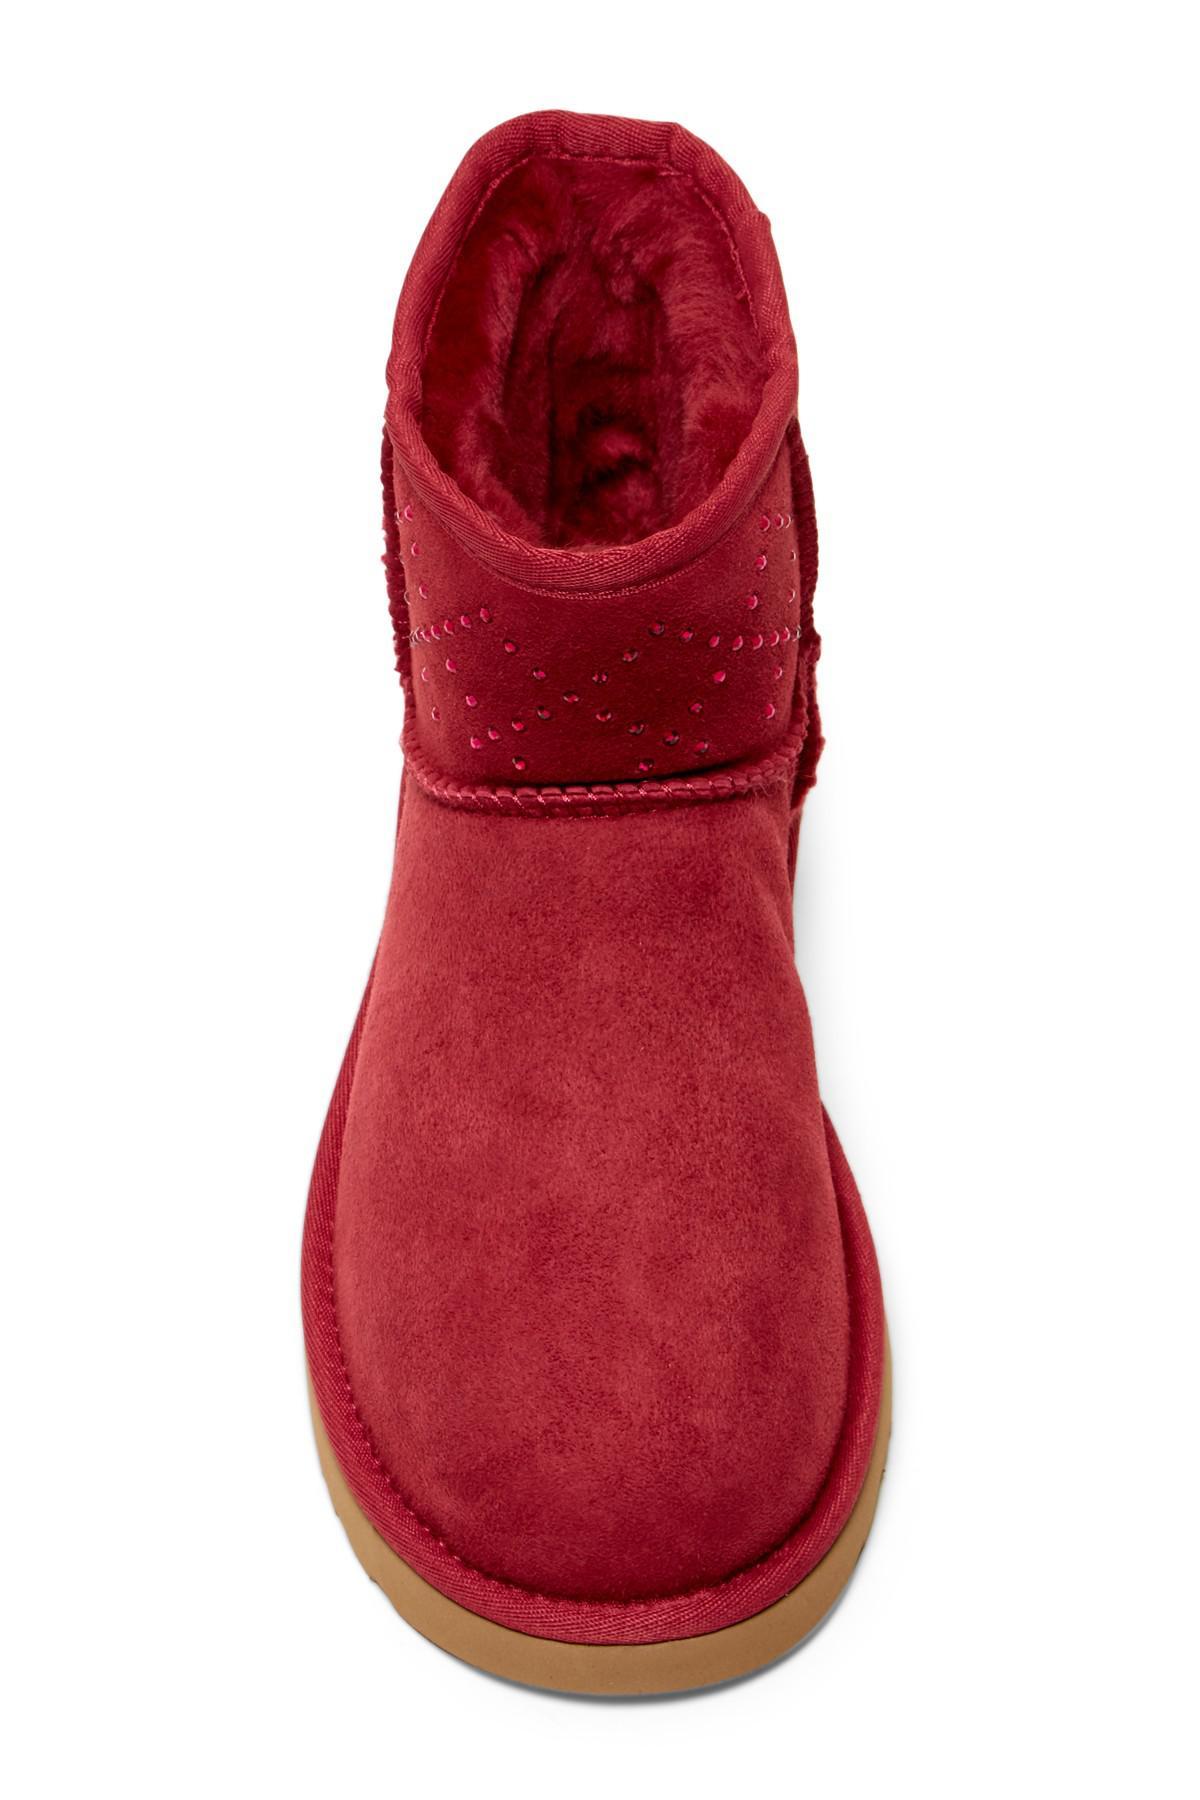 2a1328b3cc0 Ugg Red Classic Mini Swarovski Crystal Boot